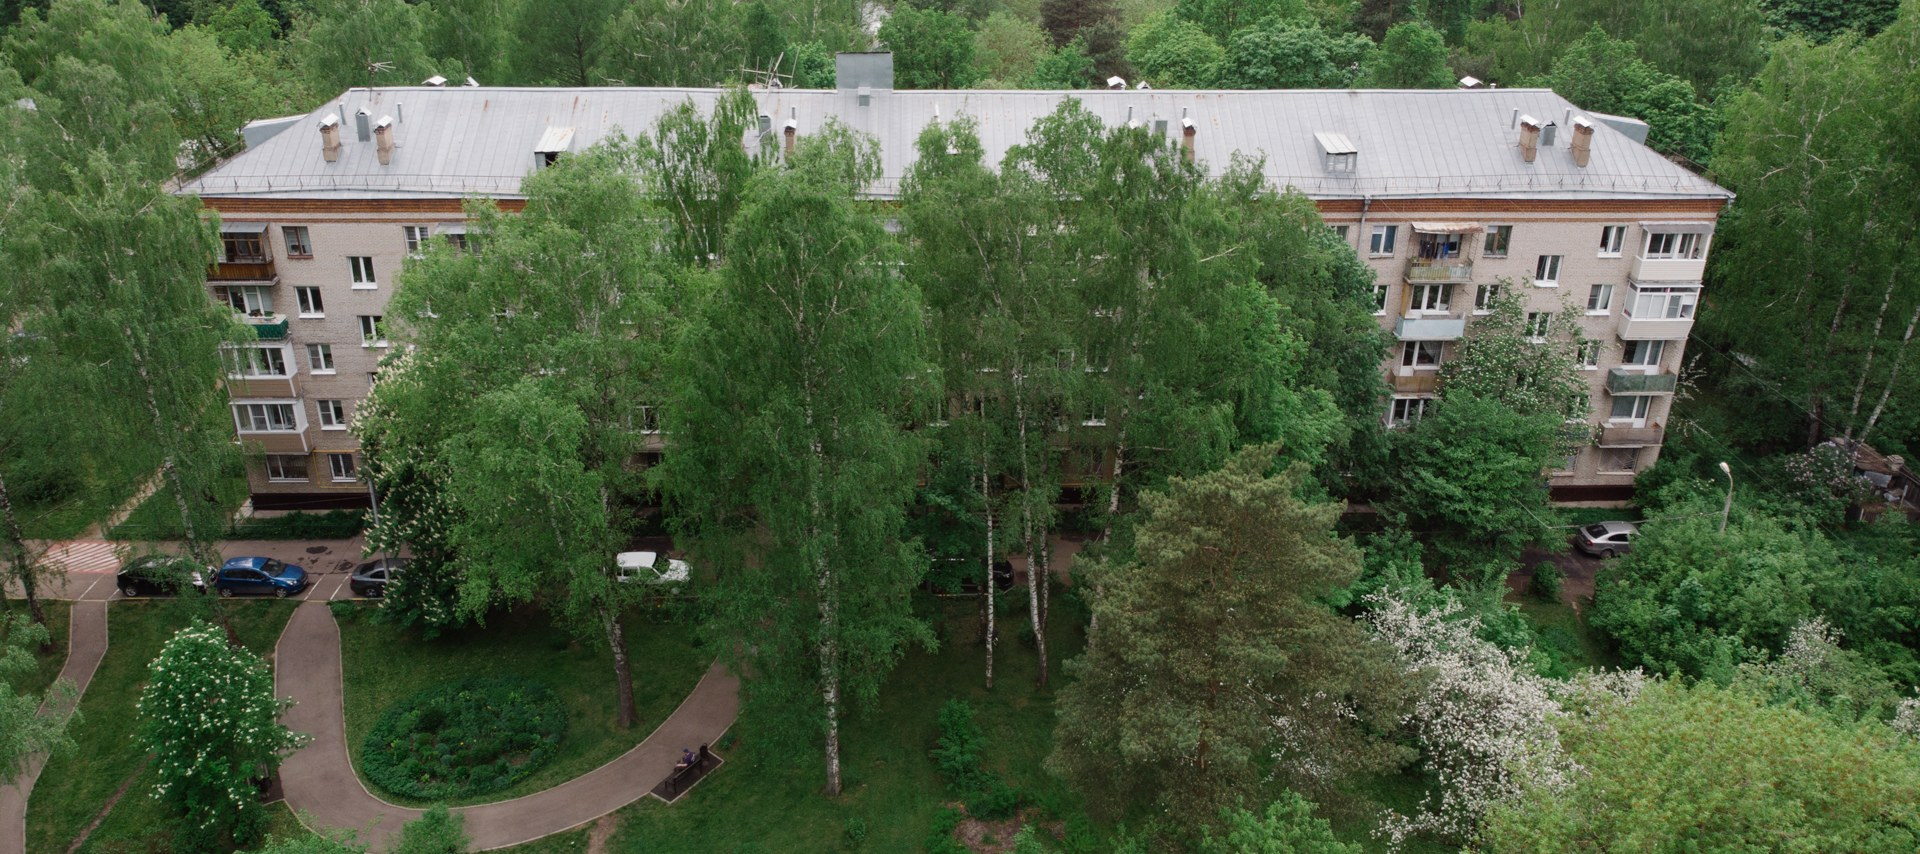 Как живут москвичи в хрущевке и сталинке посреди леса